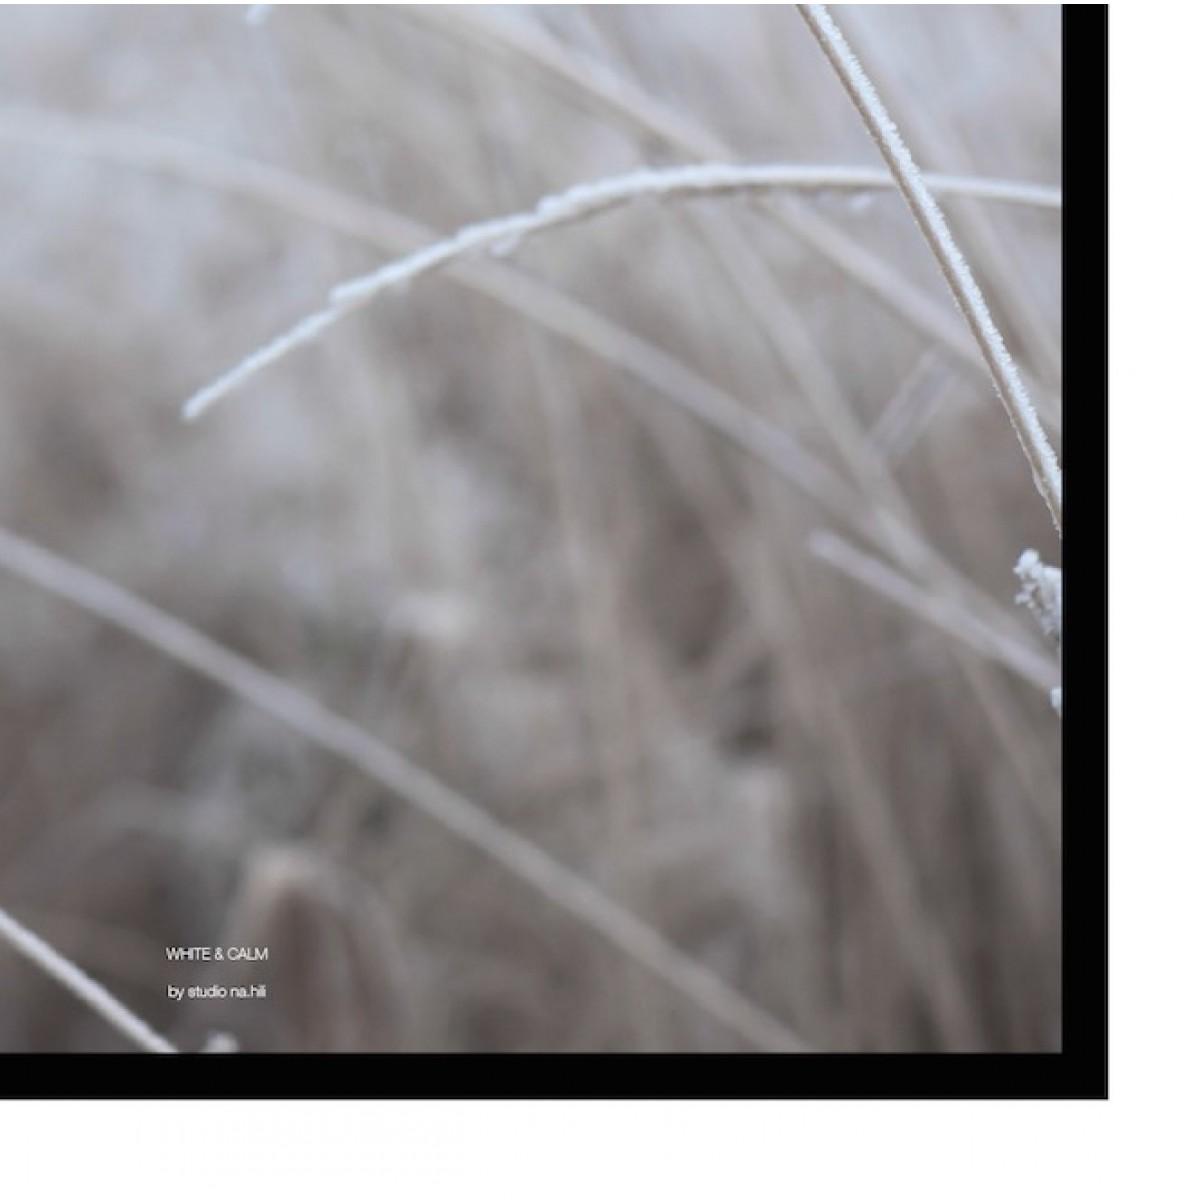 nahili white & calm Artprint - A3, A1 or 50x70  - Poster Gräser